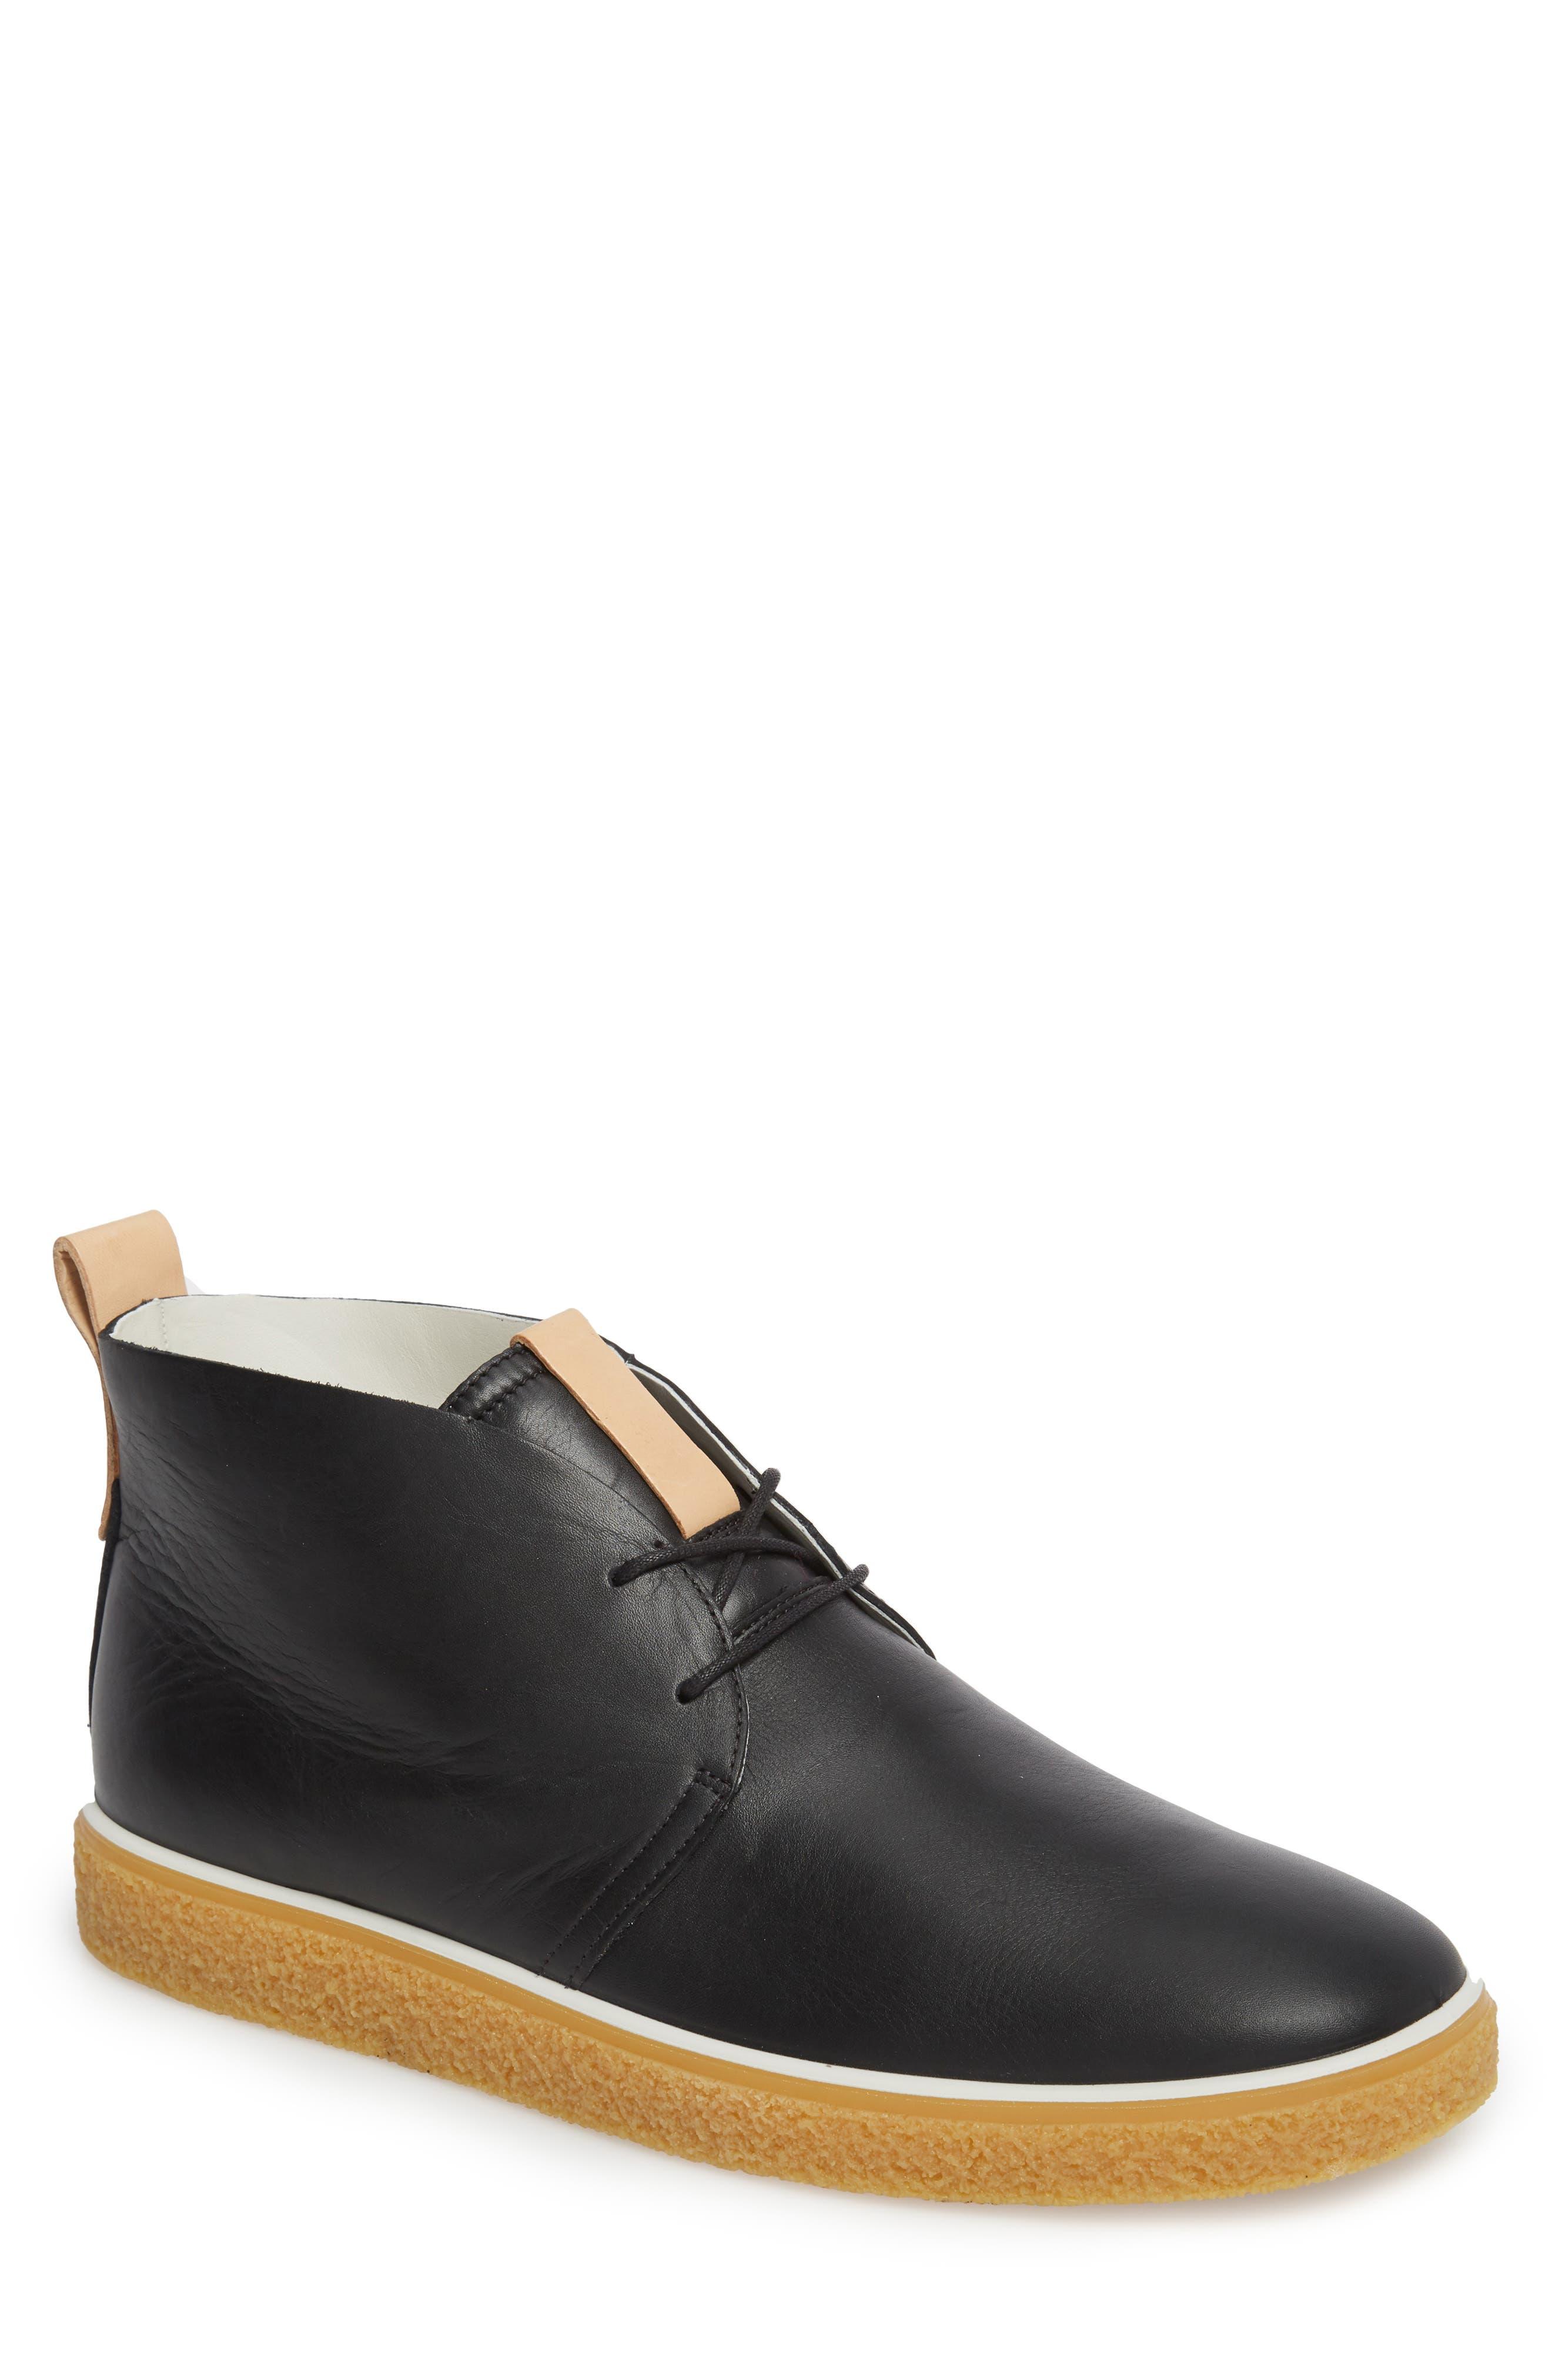 Crepetray Chukka Boot,                         Main,                         color, Black Leather